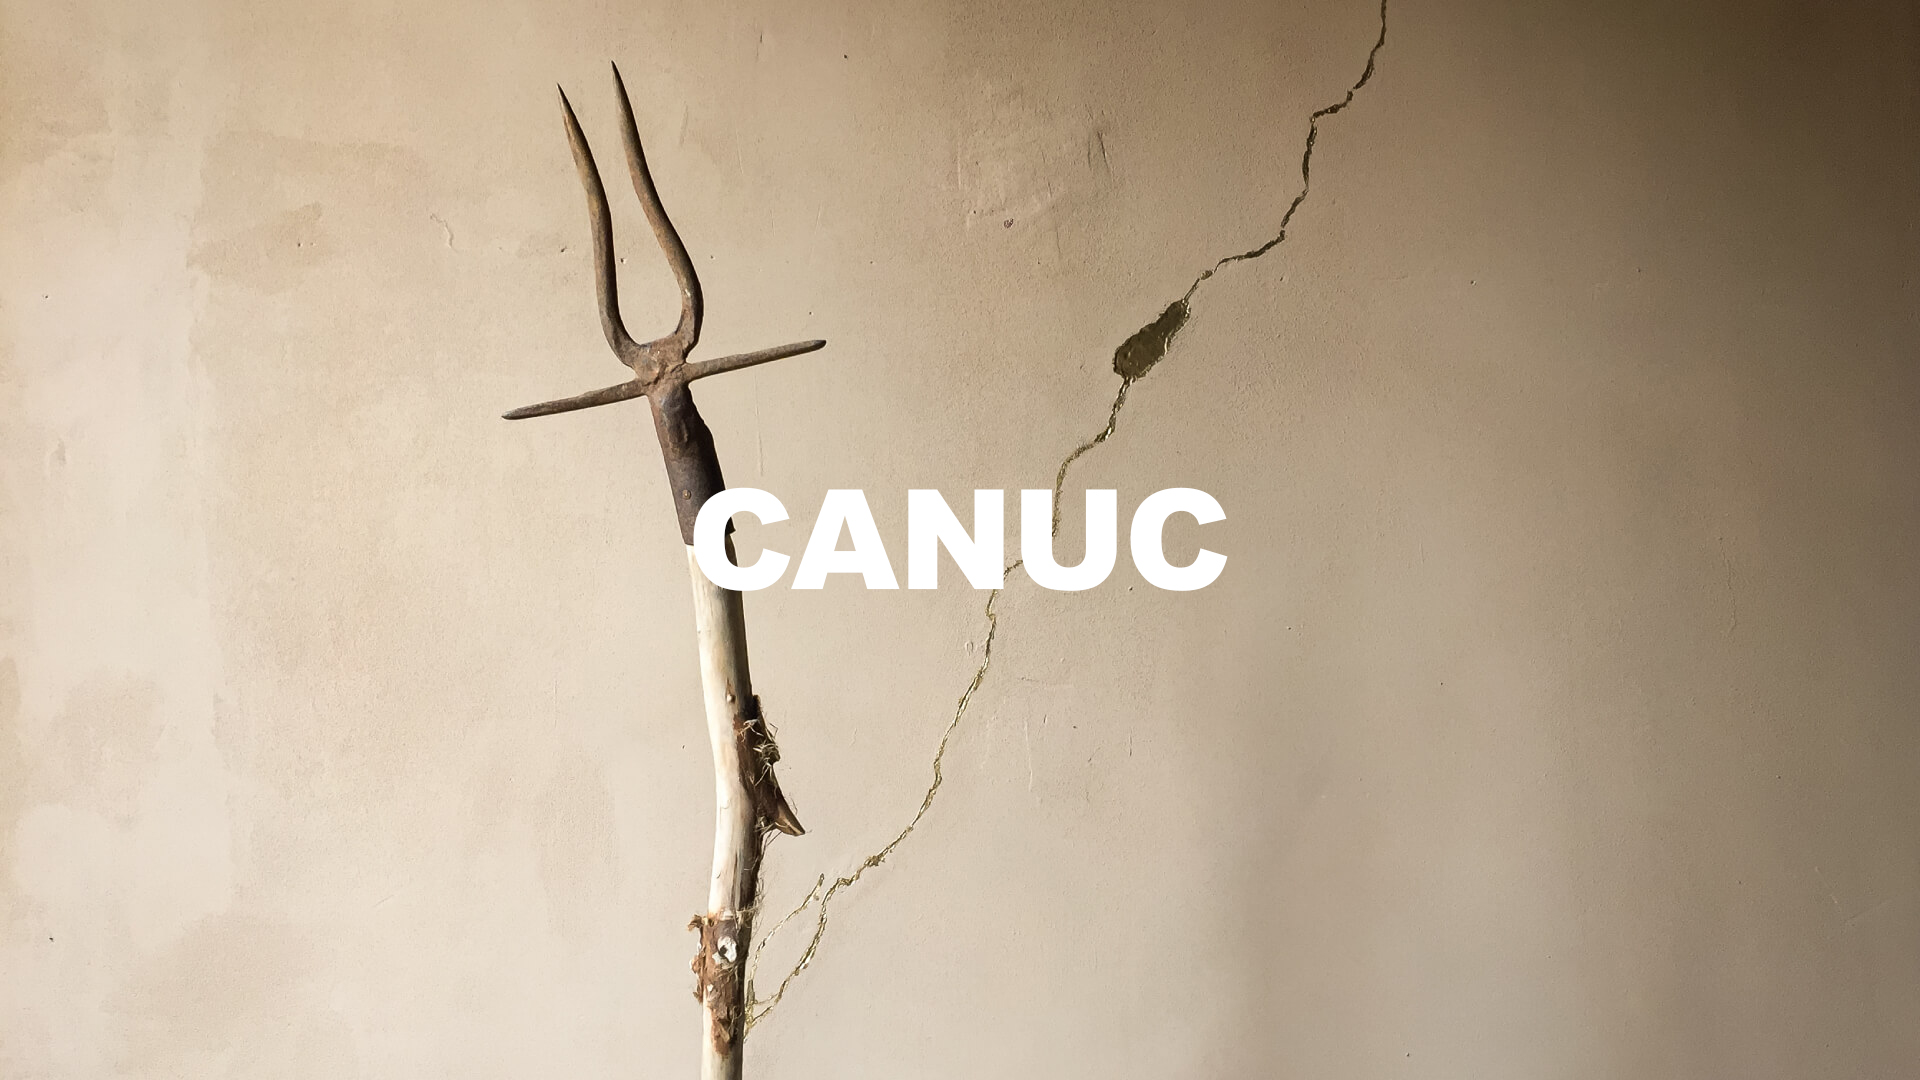 CANUC-AARON-NACHTAILER-ART-ARTIST-COVER